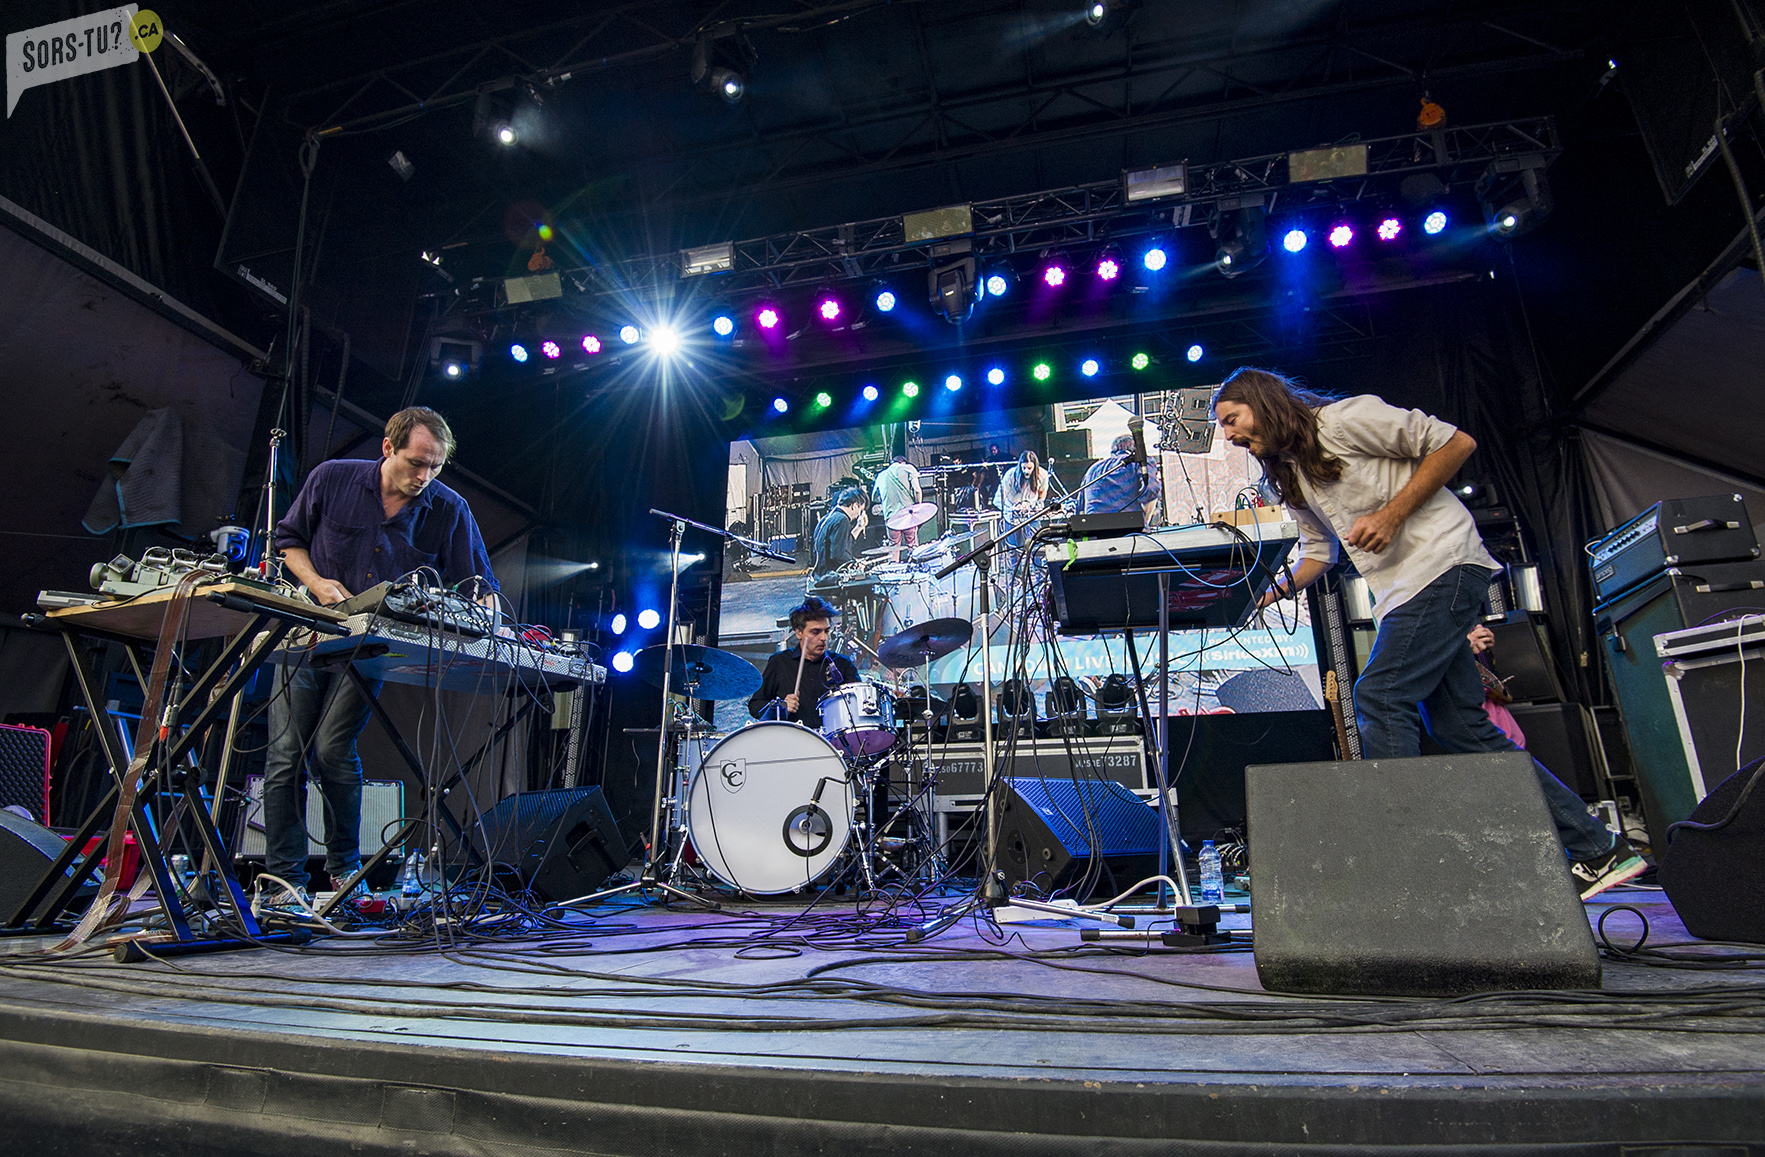 Holyfuck-rbcbluesfest-ottawa-festival-sorstu-2016-3